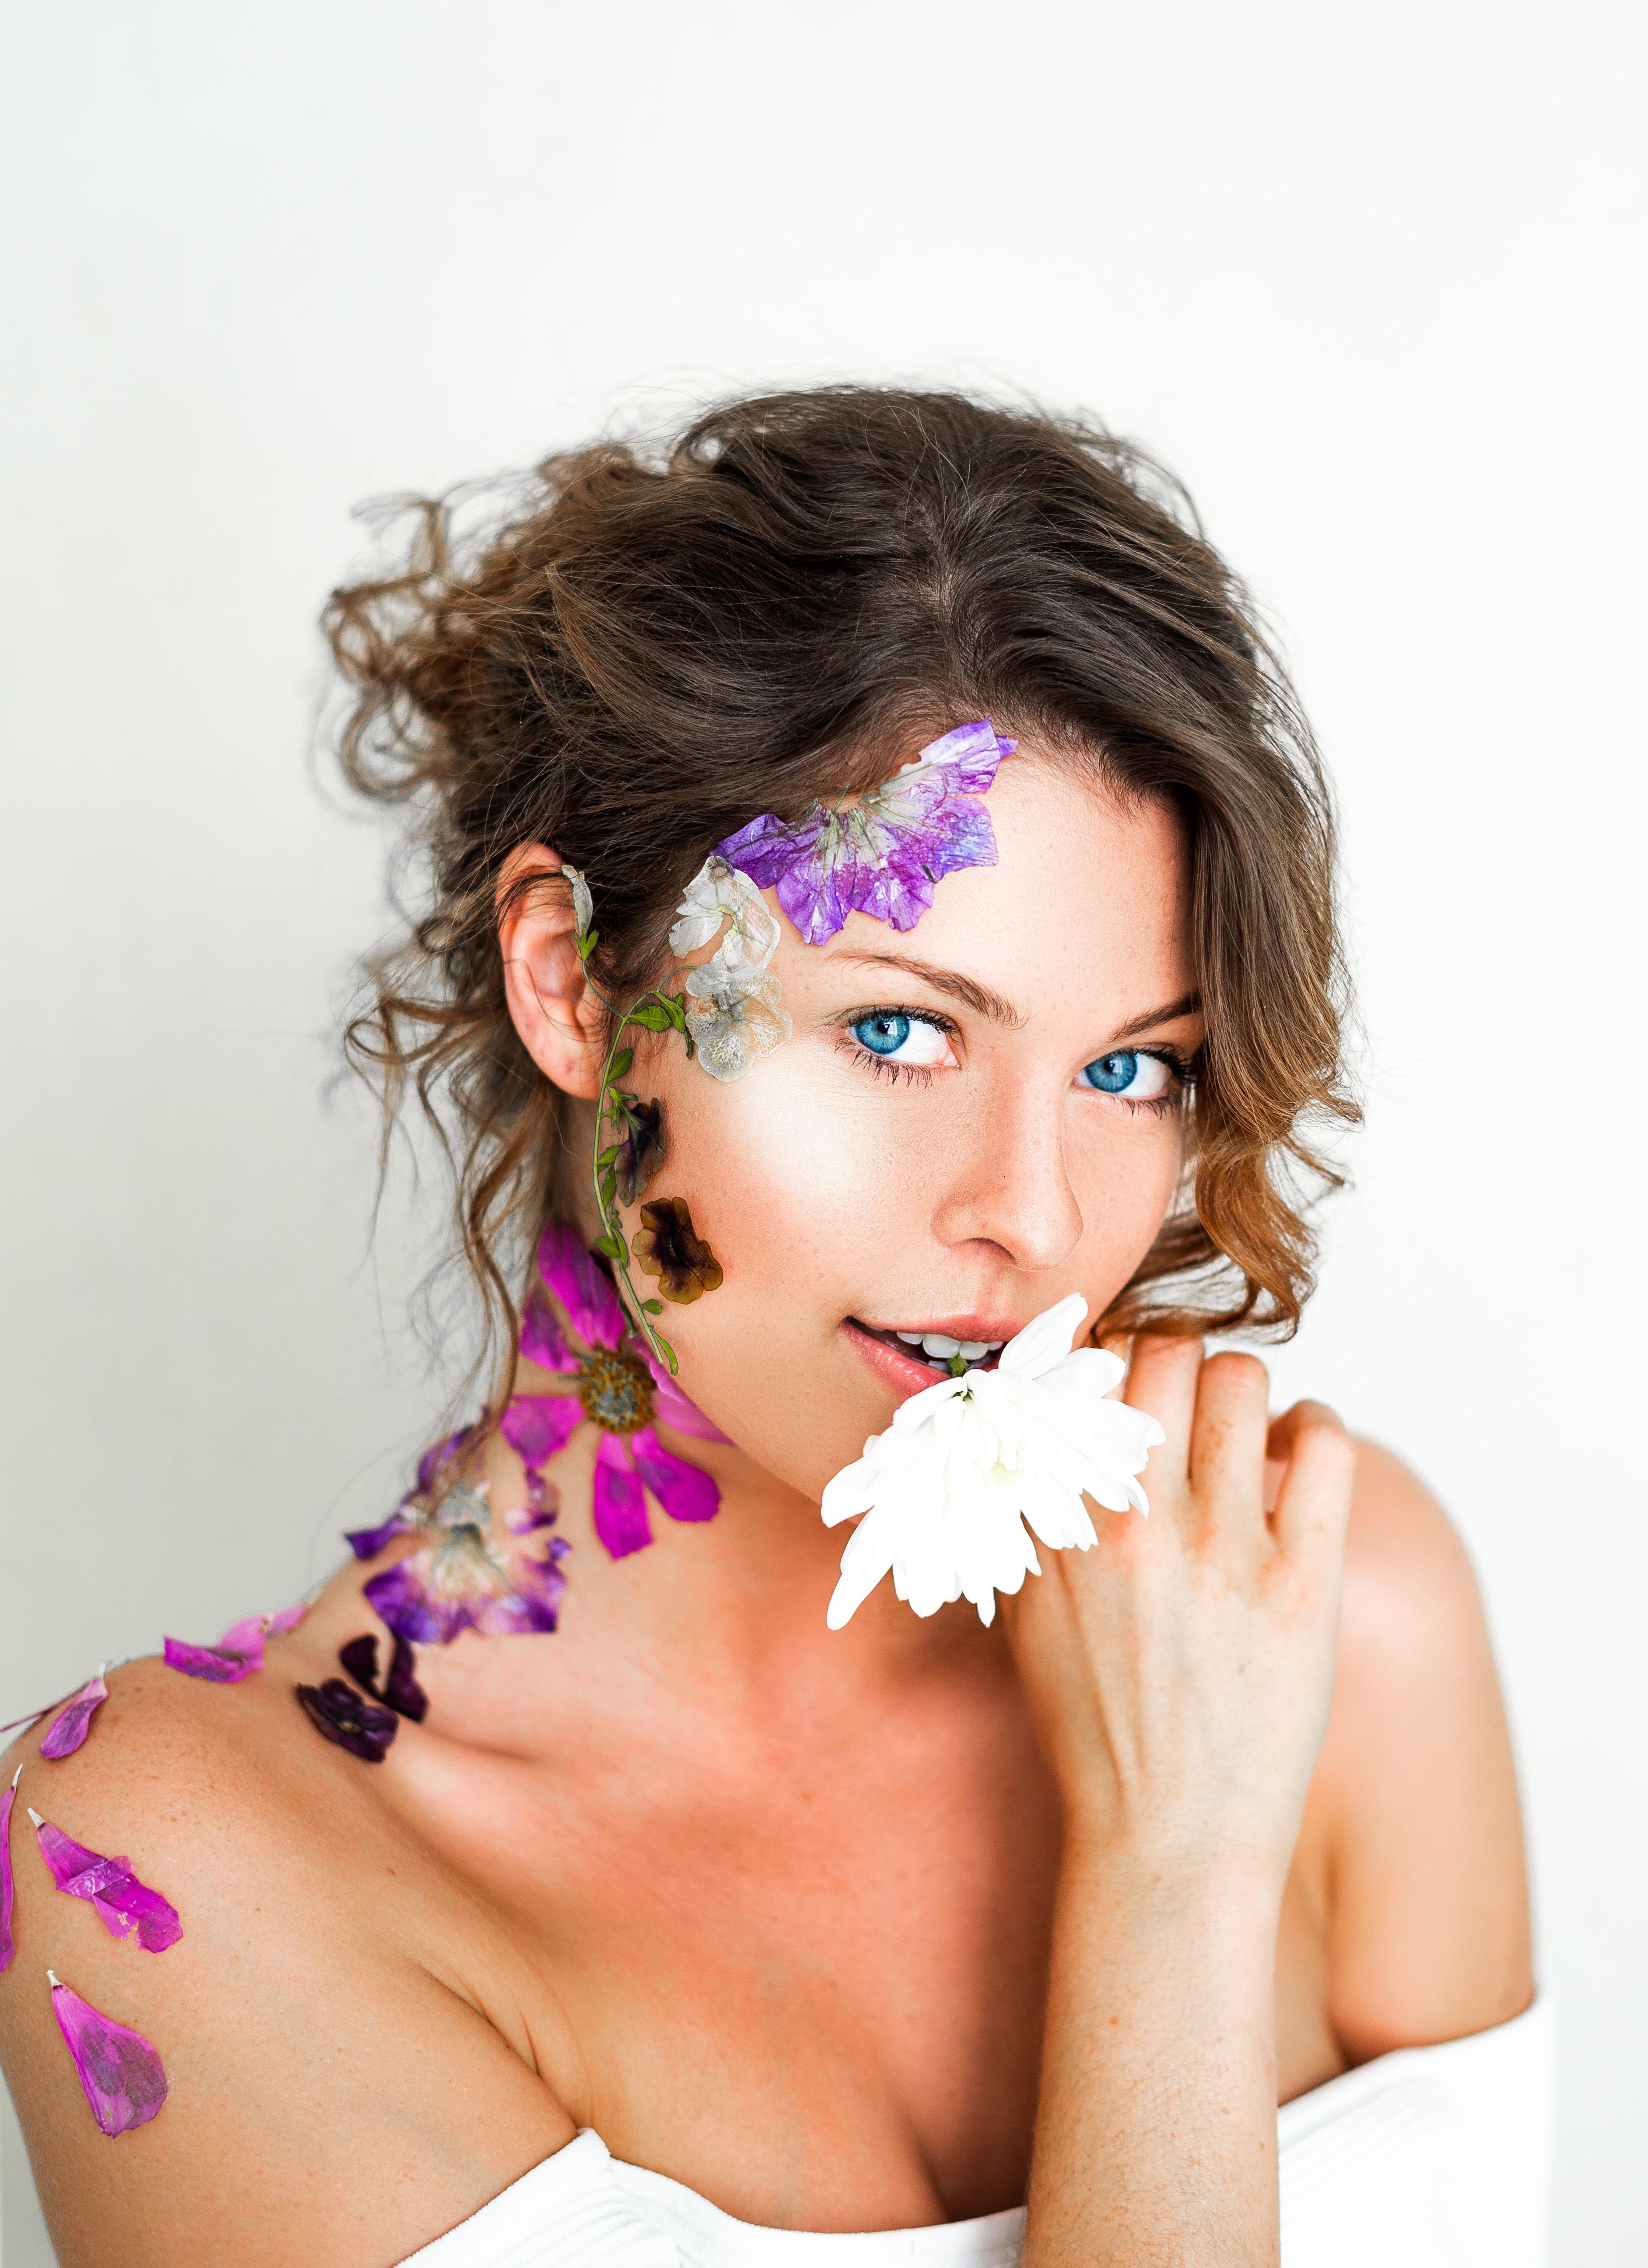 woman biting white flower